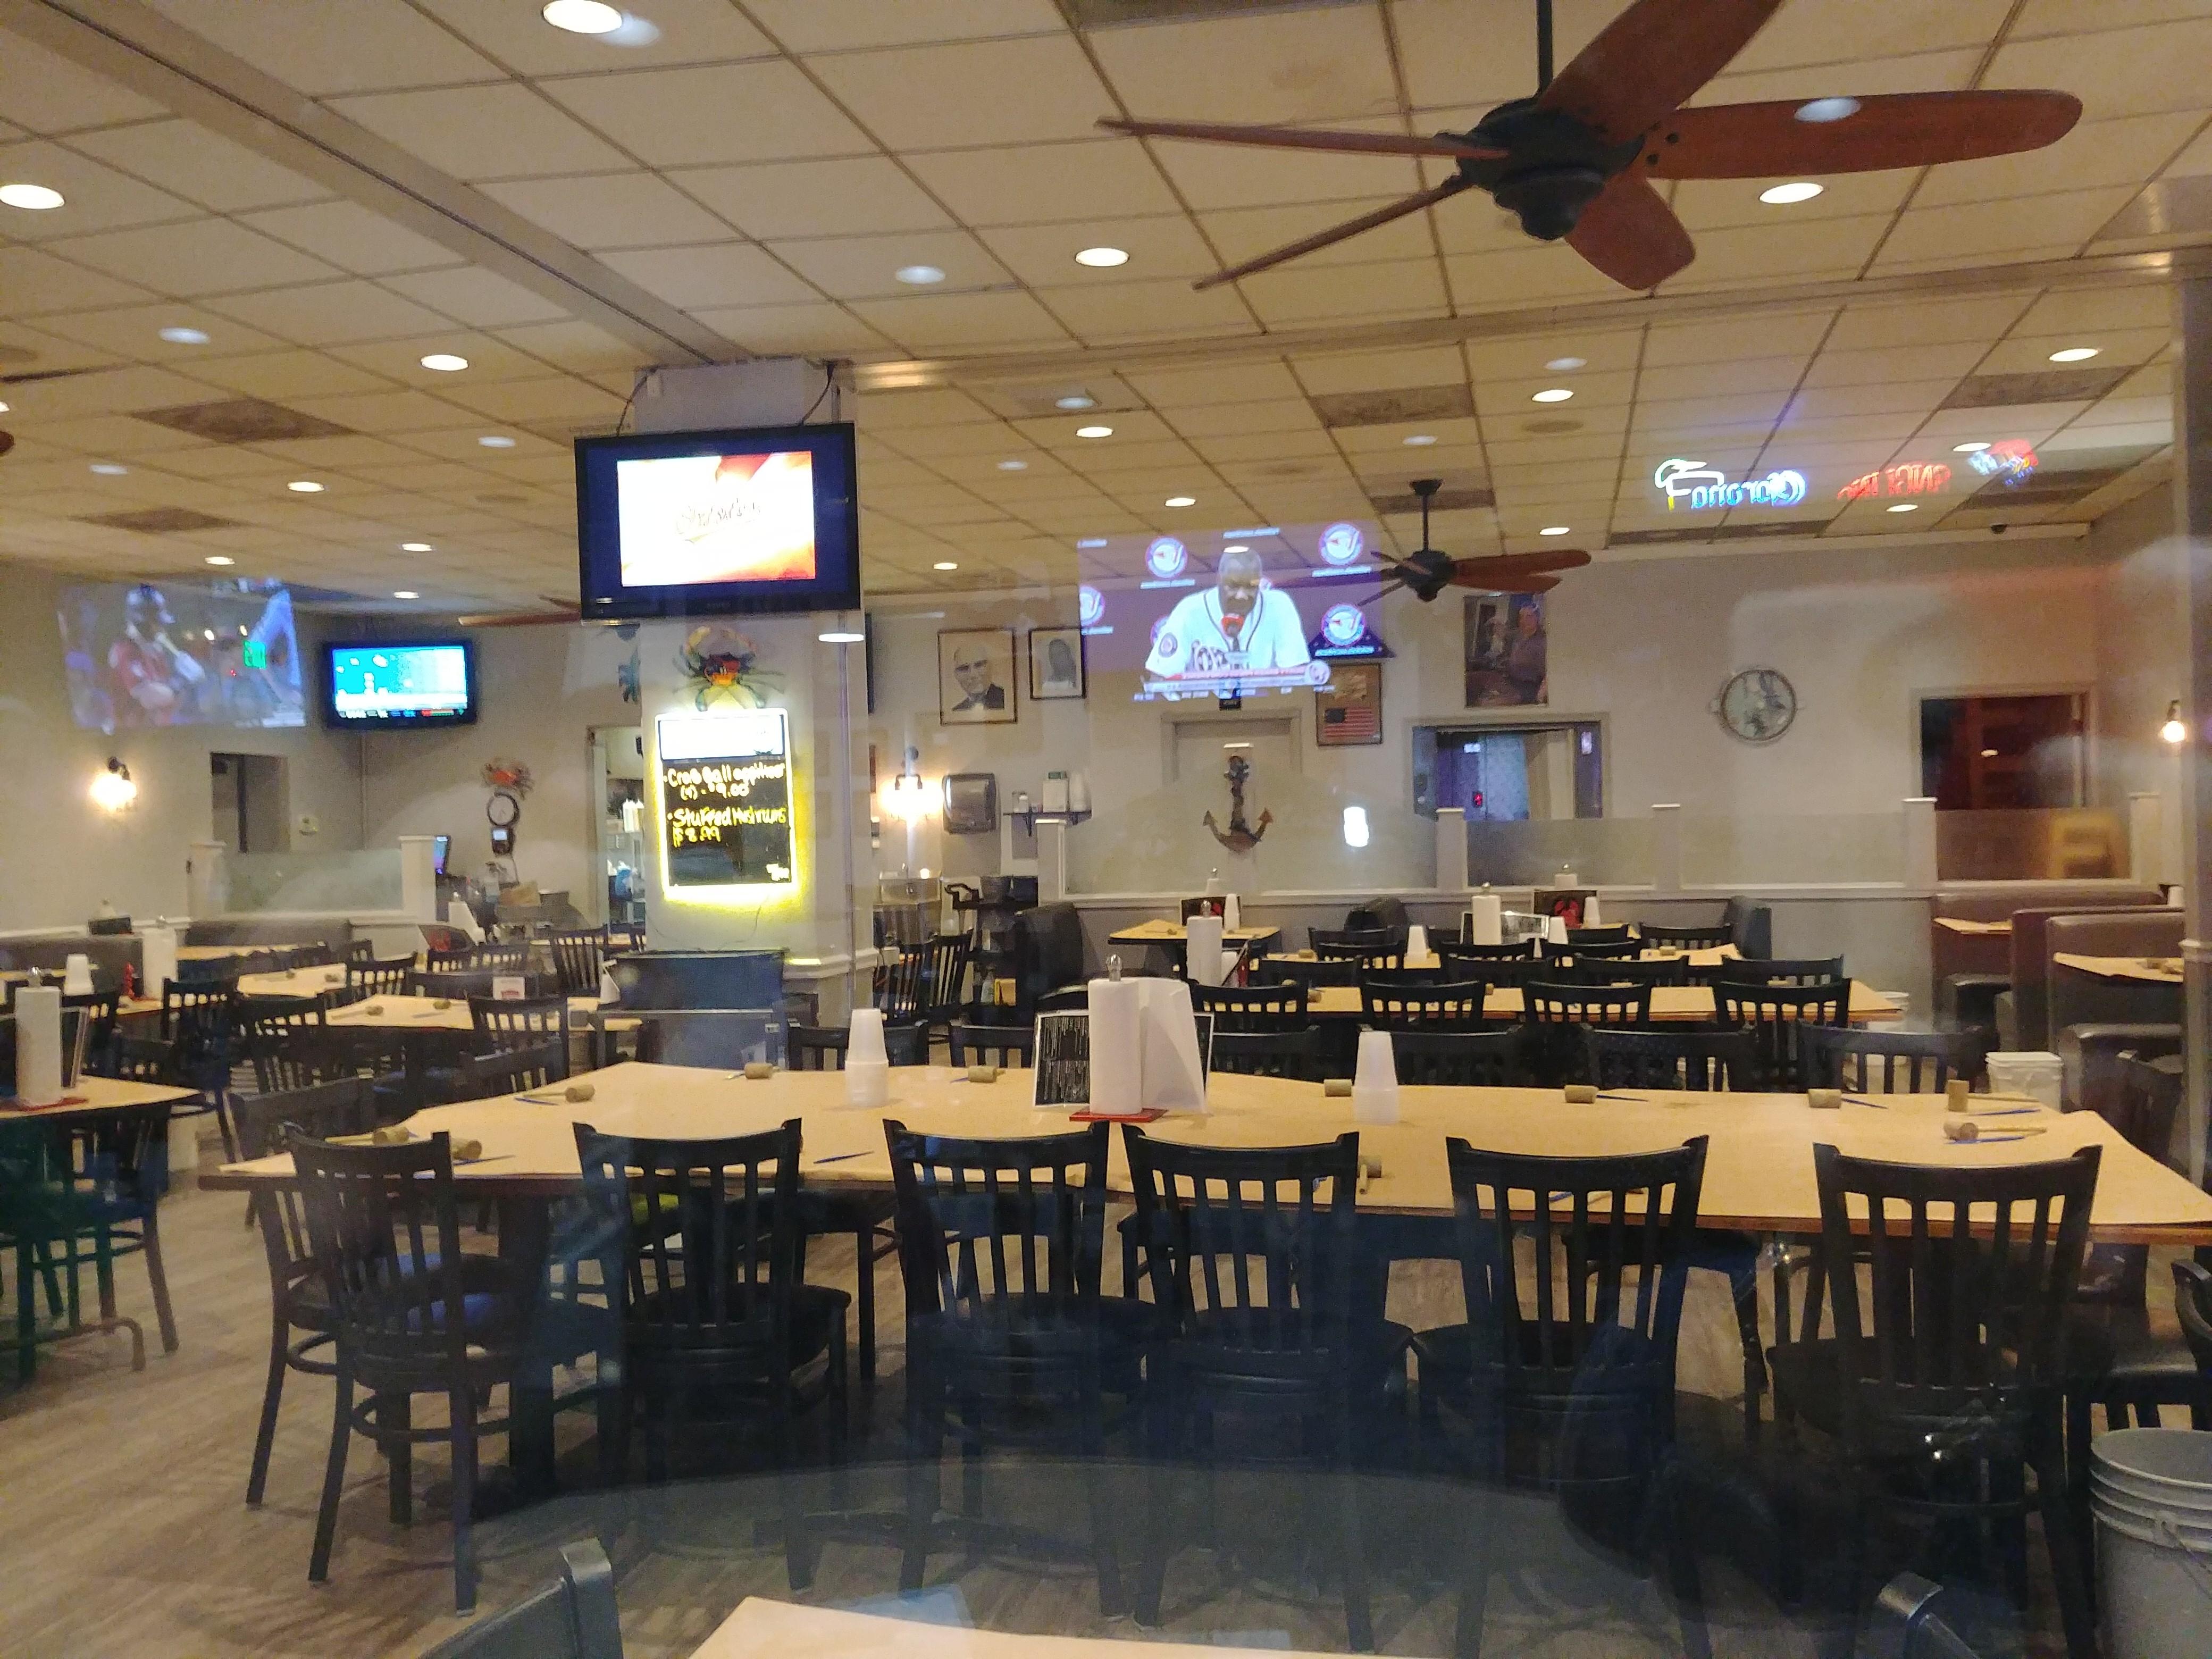 Mr bills terrace inn crab house and sports bar essex mr bills terrace inn crab house and sports bar essex restaurant review zagat kristyandbryce Gallery